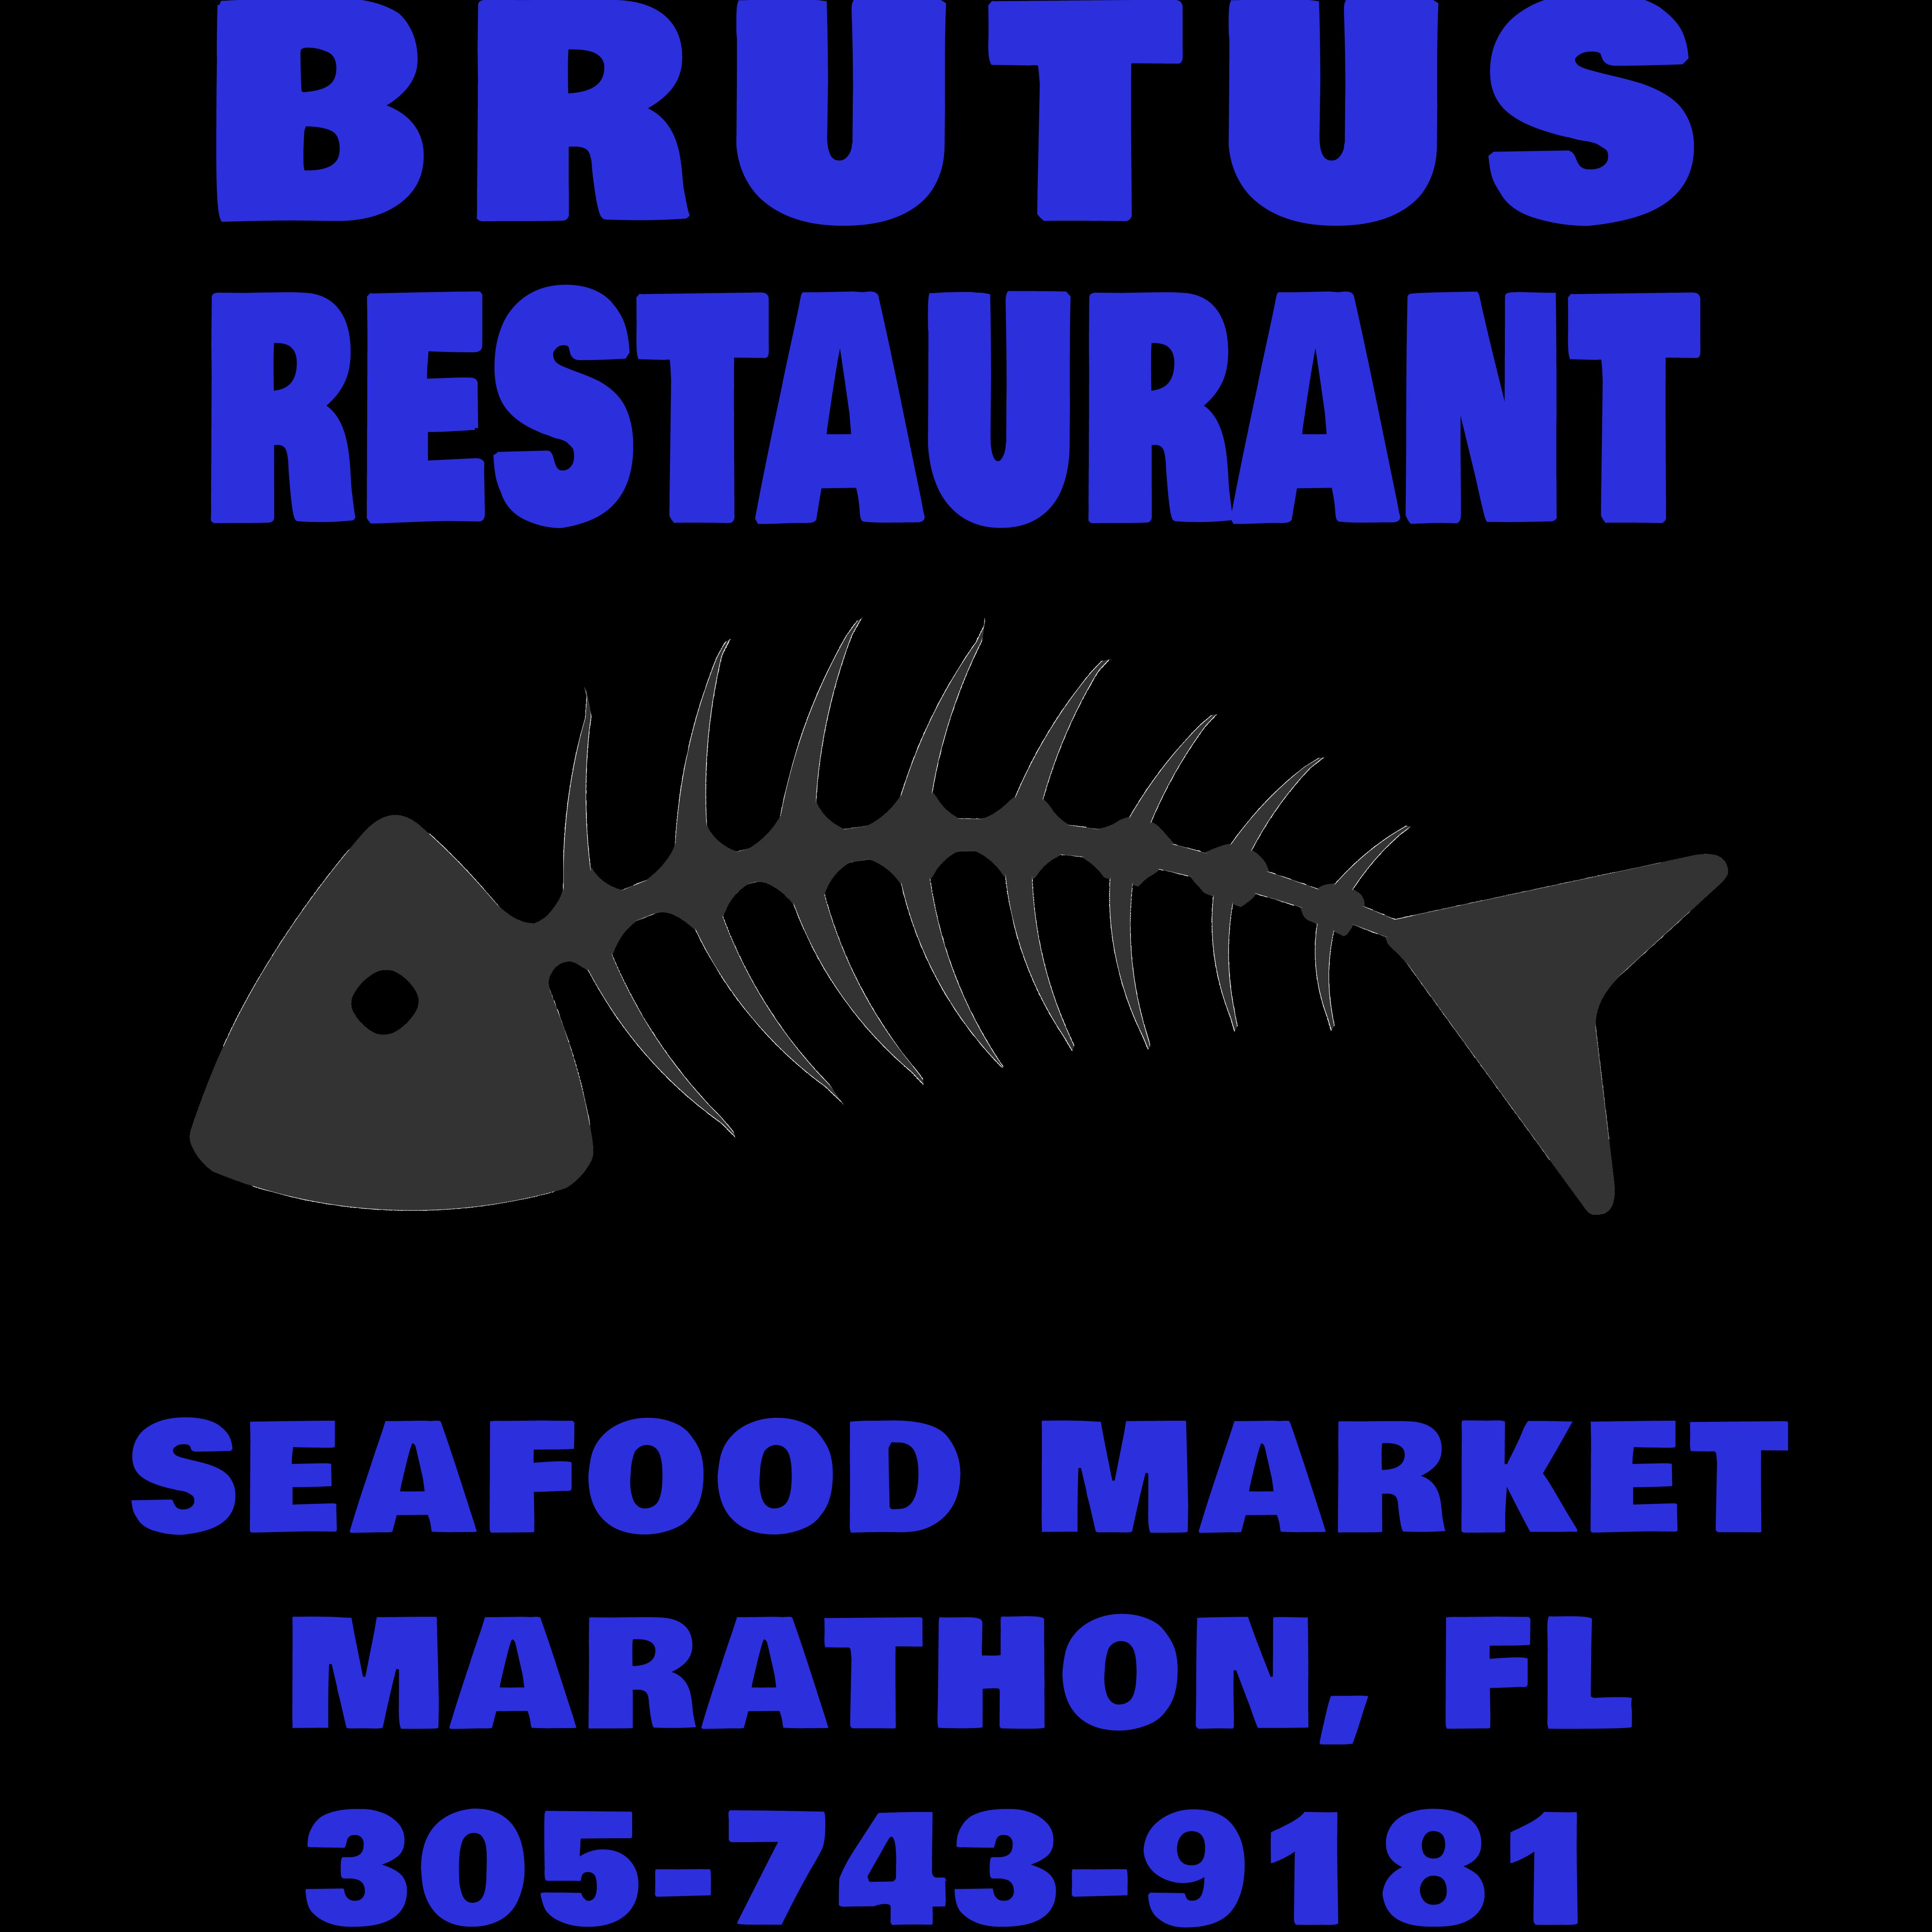 Brutus Restaurant & Seafood Market